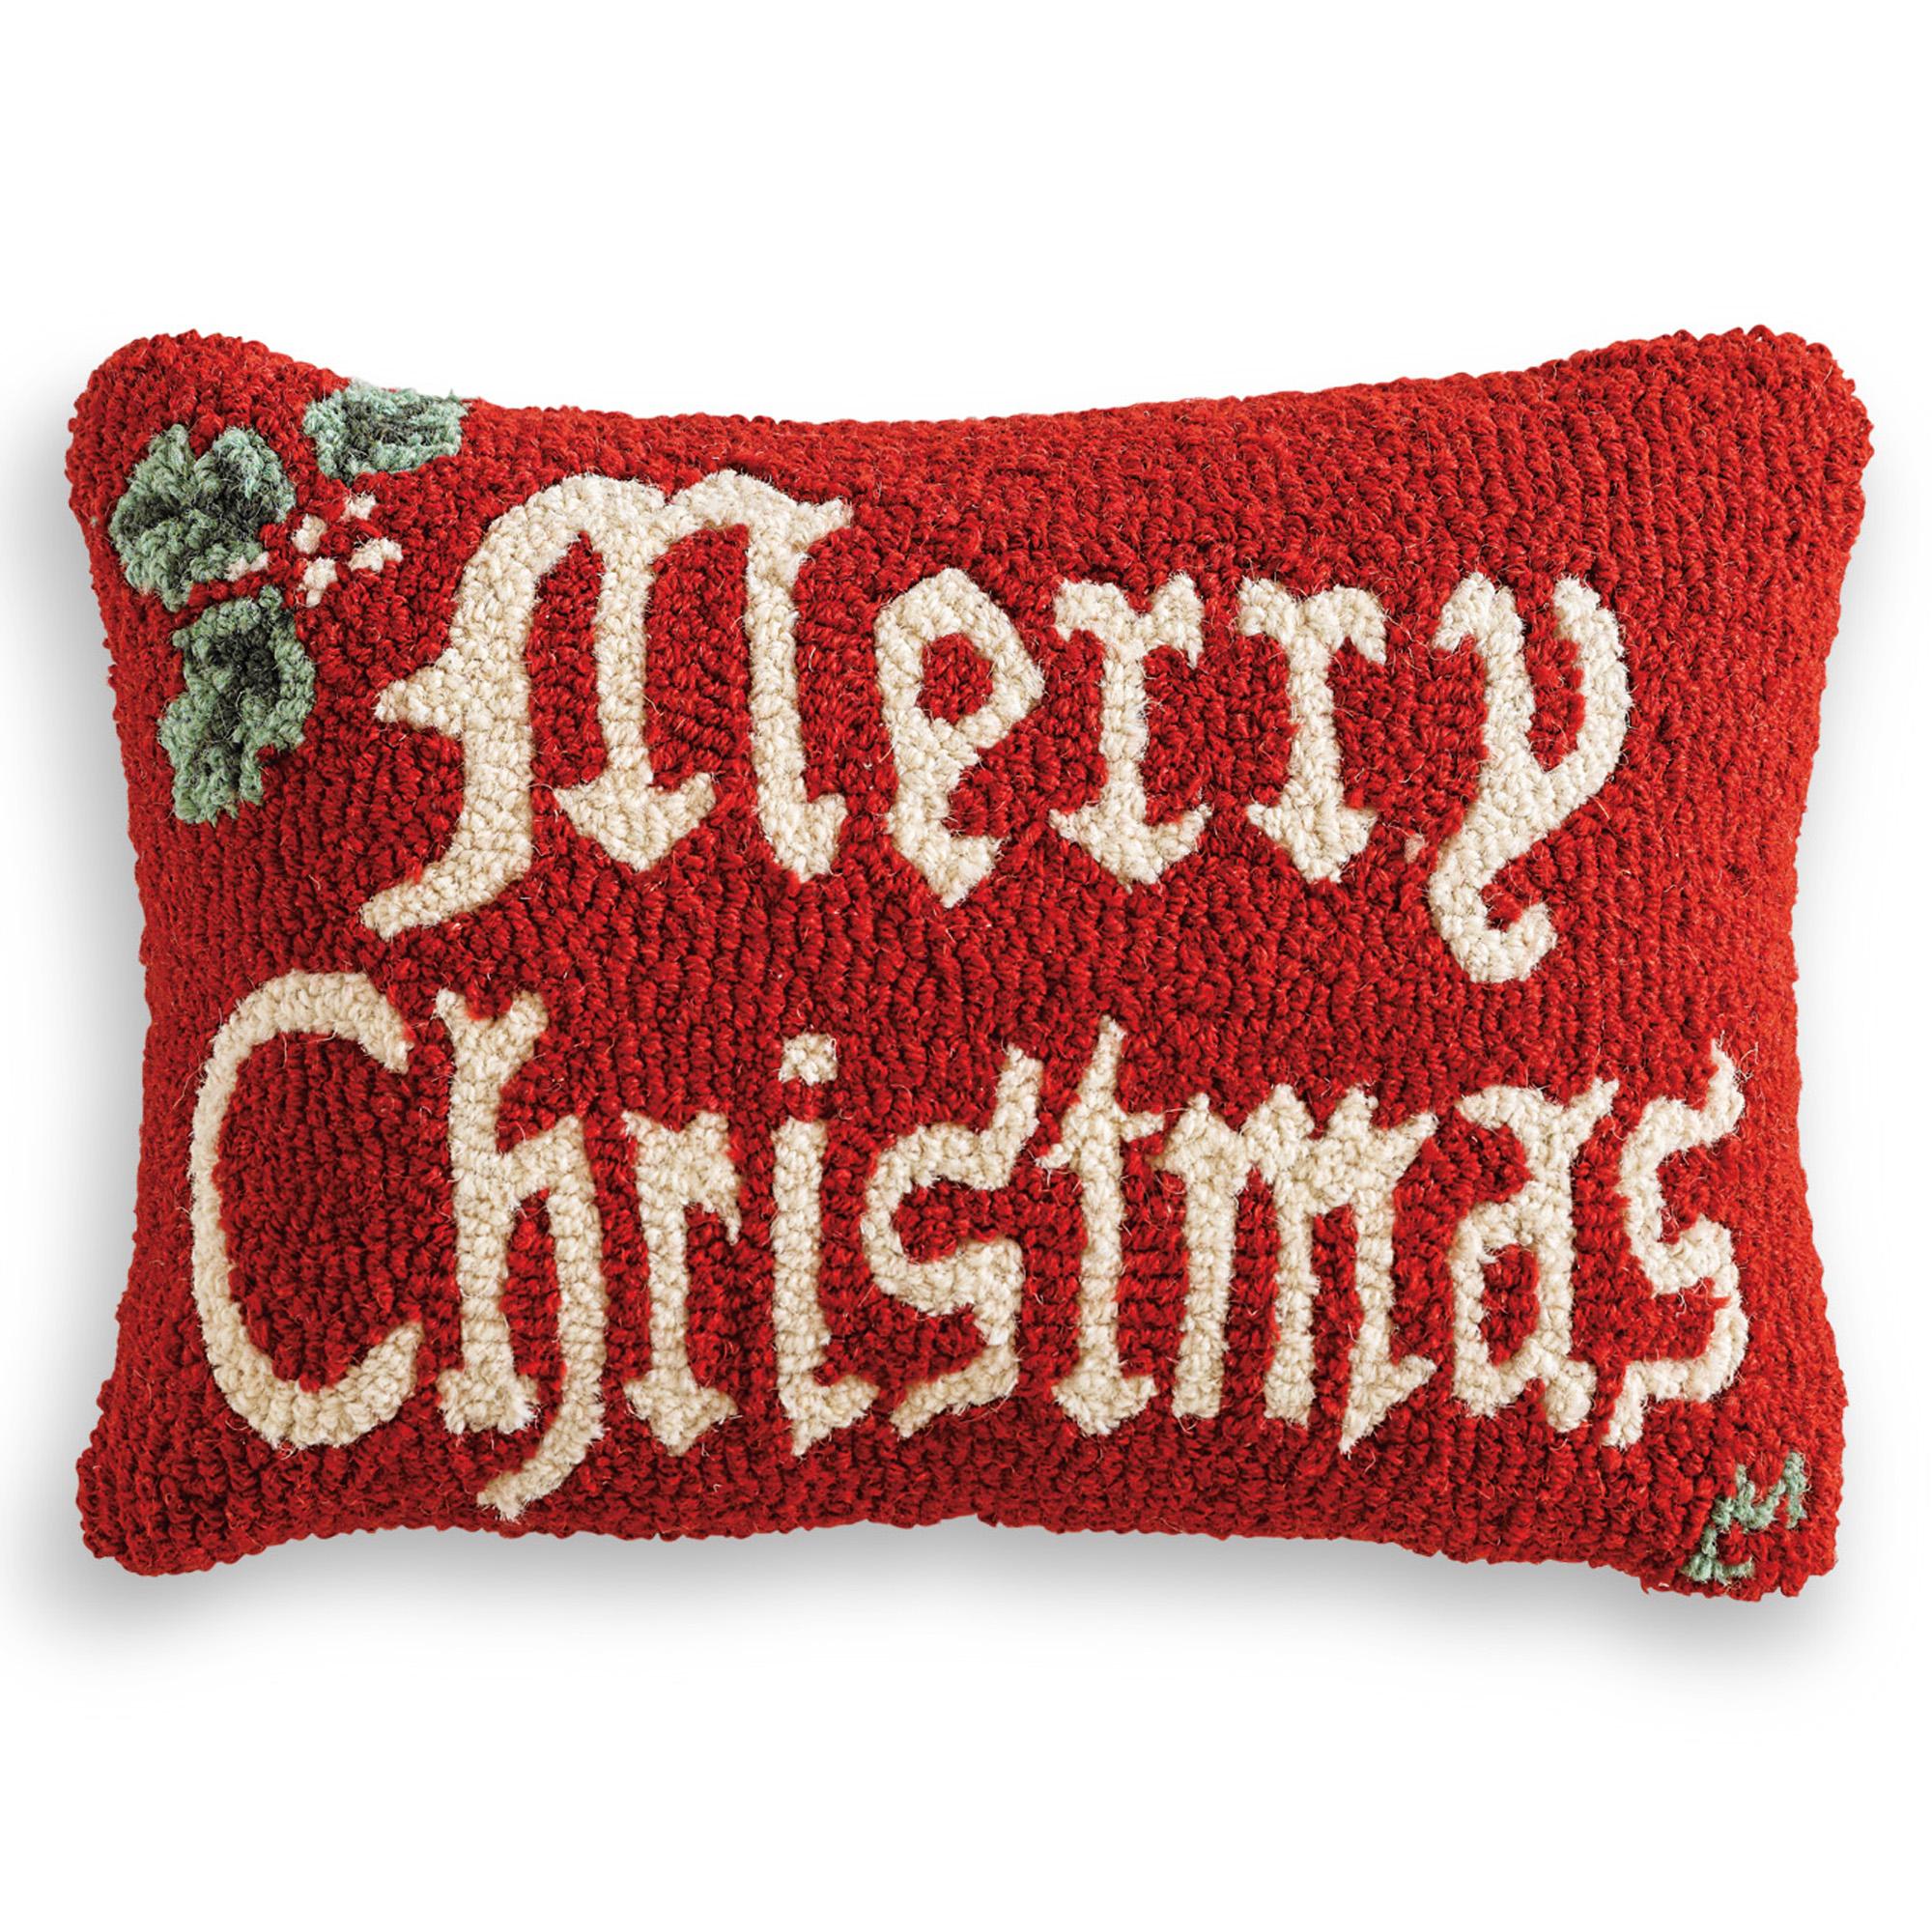 Throw Pillows Home : Merry Christmas Pillow Gump s